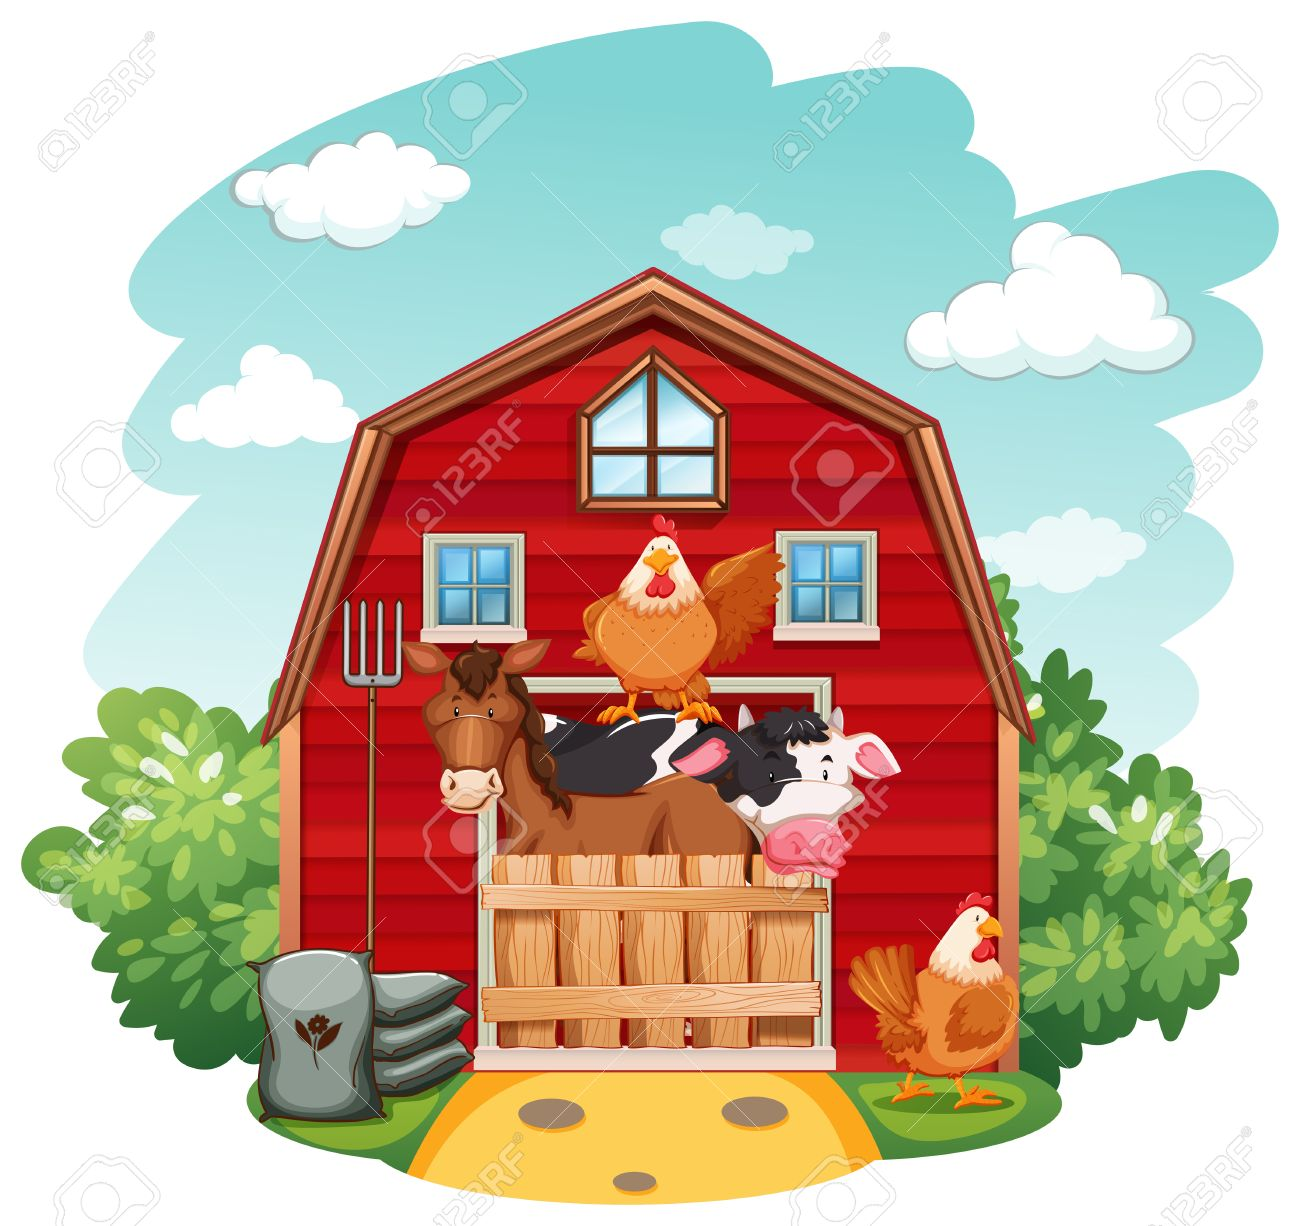 hight resolution of farm animals in the barn stock vector 42519915